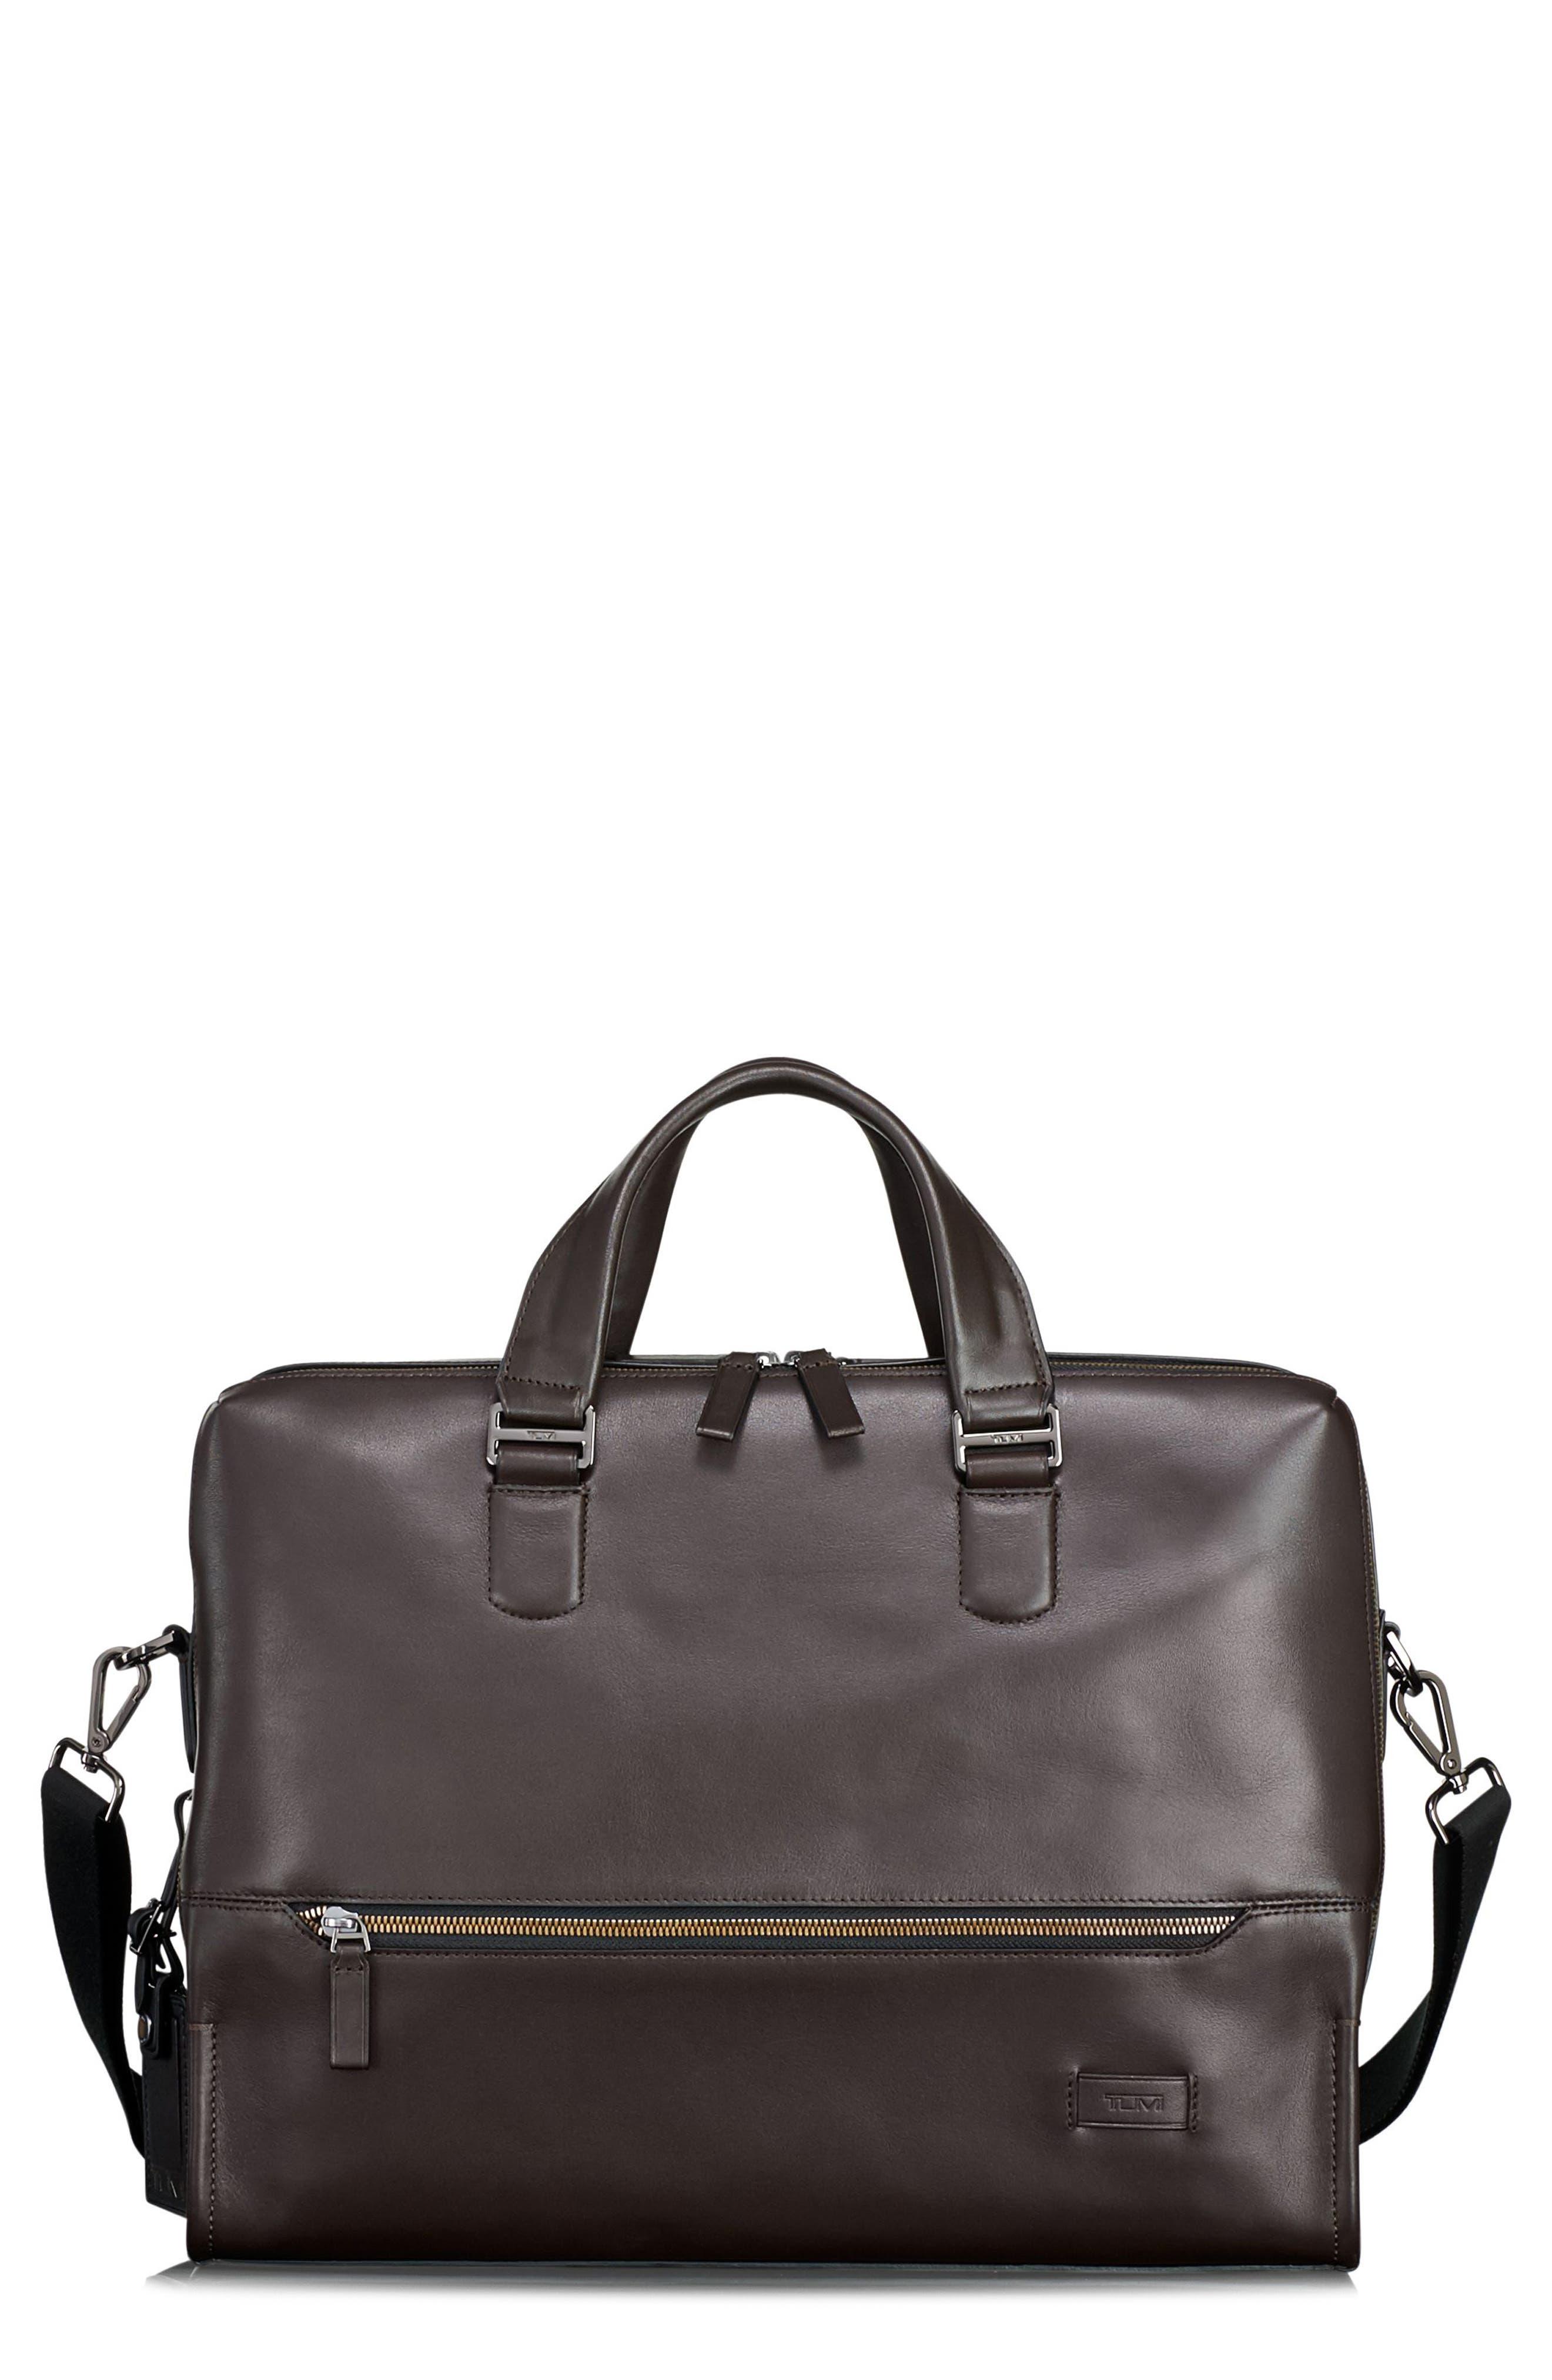 Harrison Horton Double Zip Leather Briefcase,                         Main,                         color, Brown